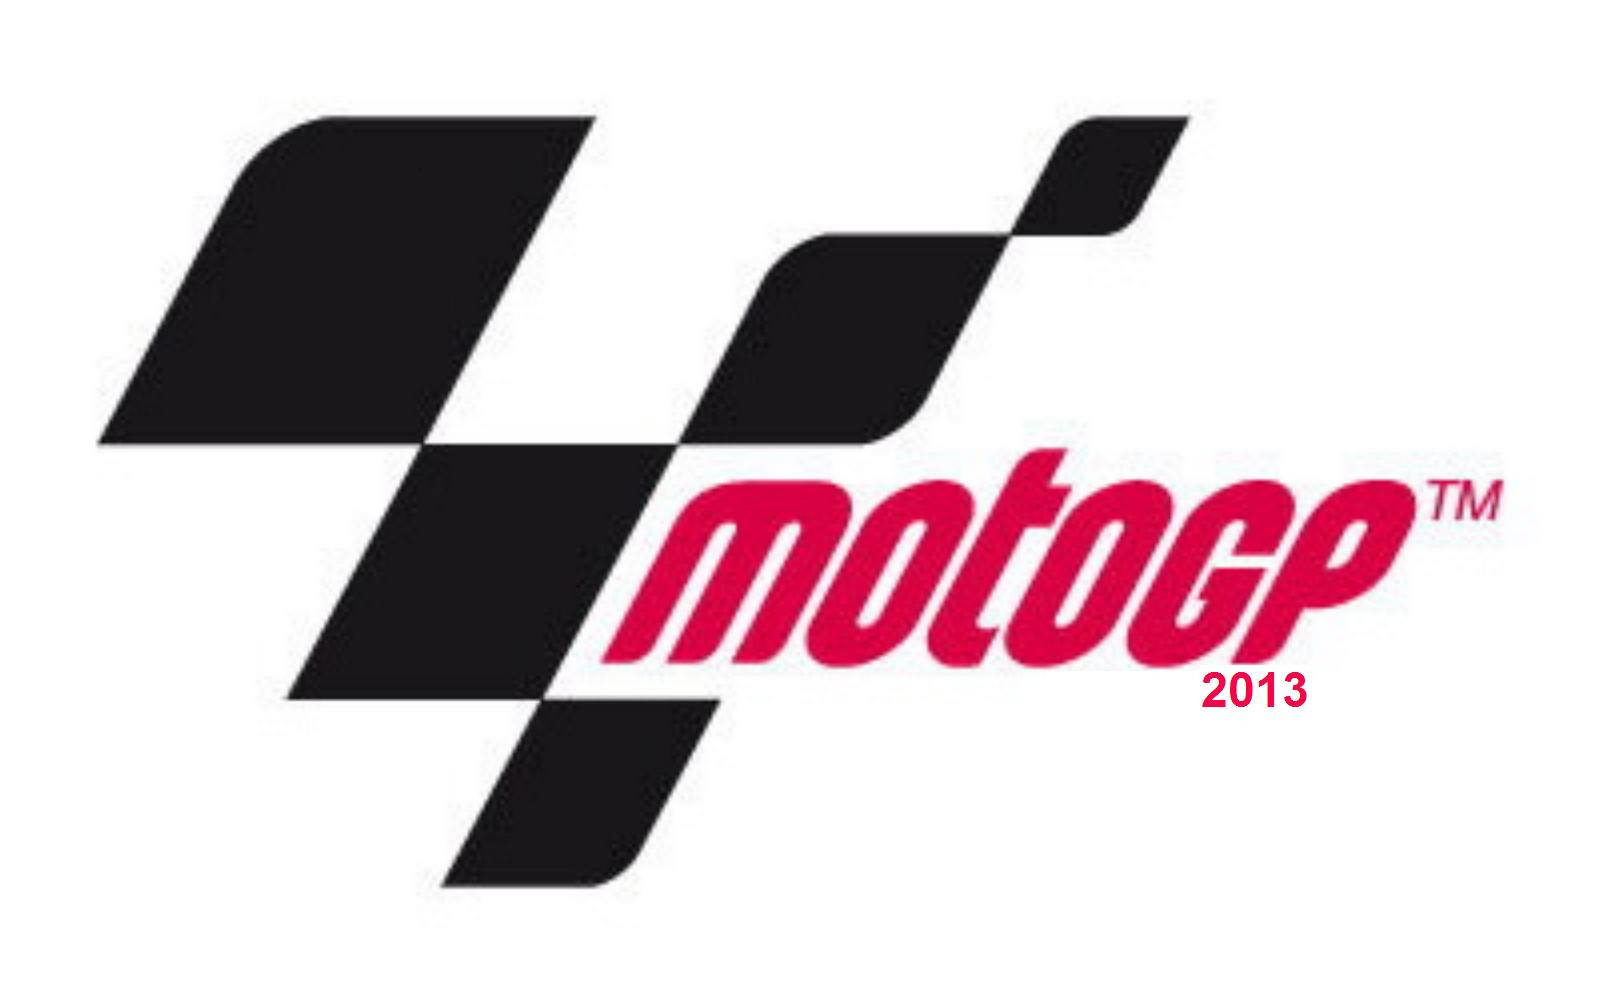 Jadwal Motogp 2013 Live di Trans7 Terupdate